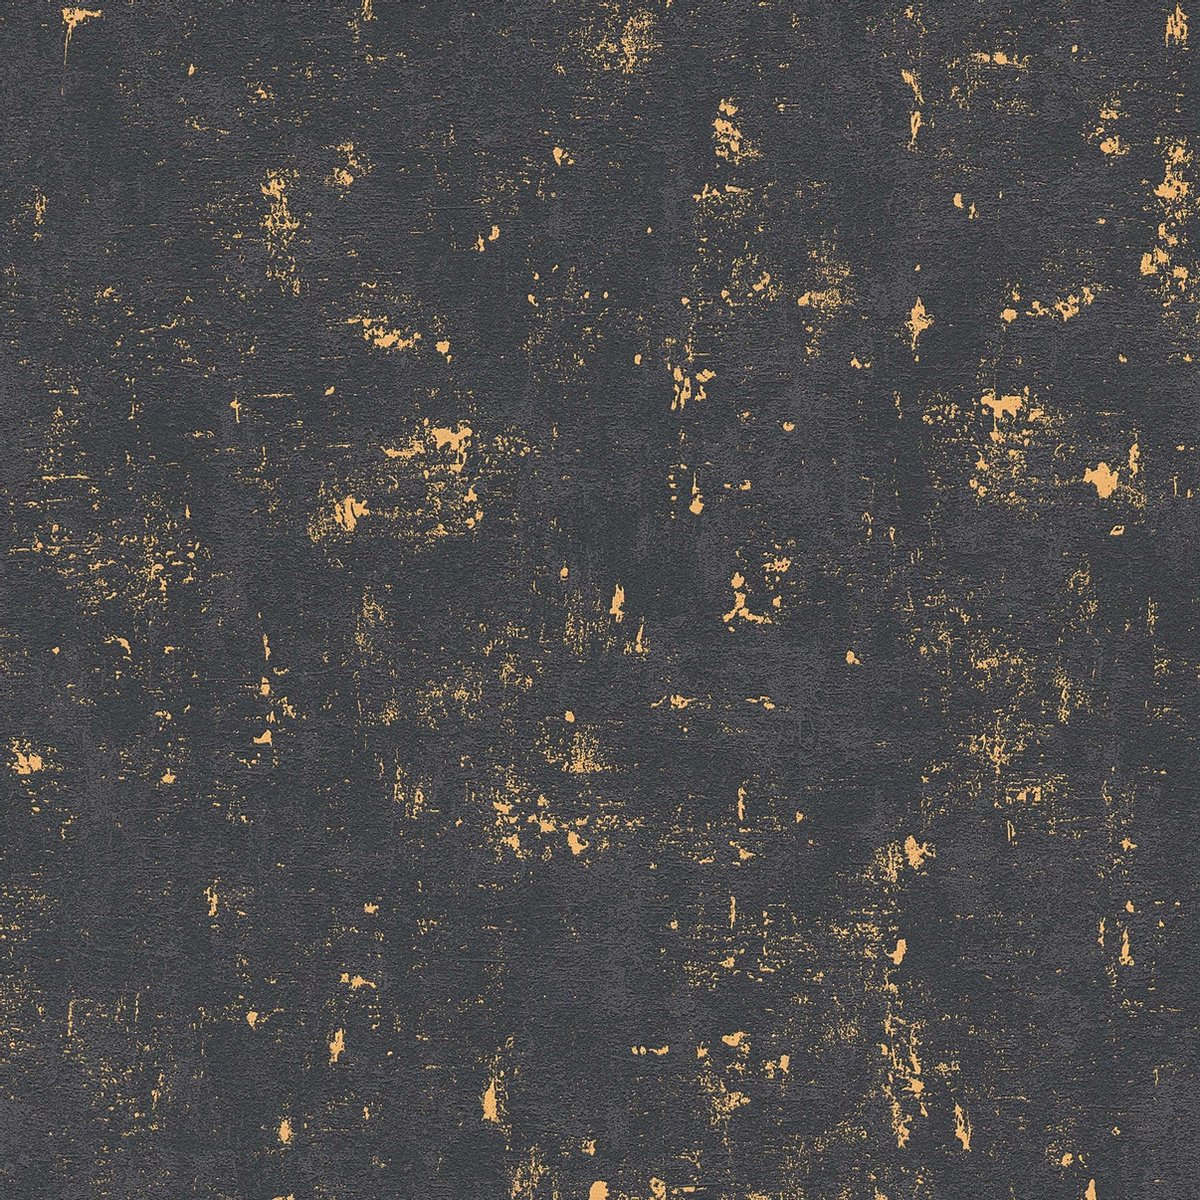 BETONLOOK BEHANG - Zwart Goud Metallic - AS Creation Trendwall